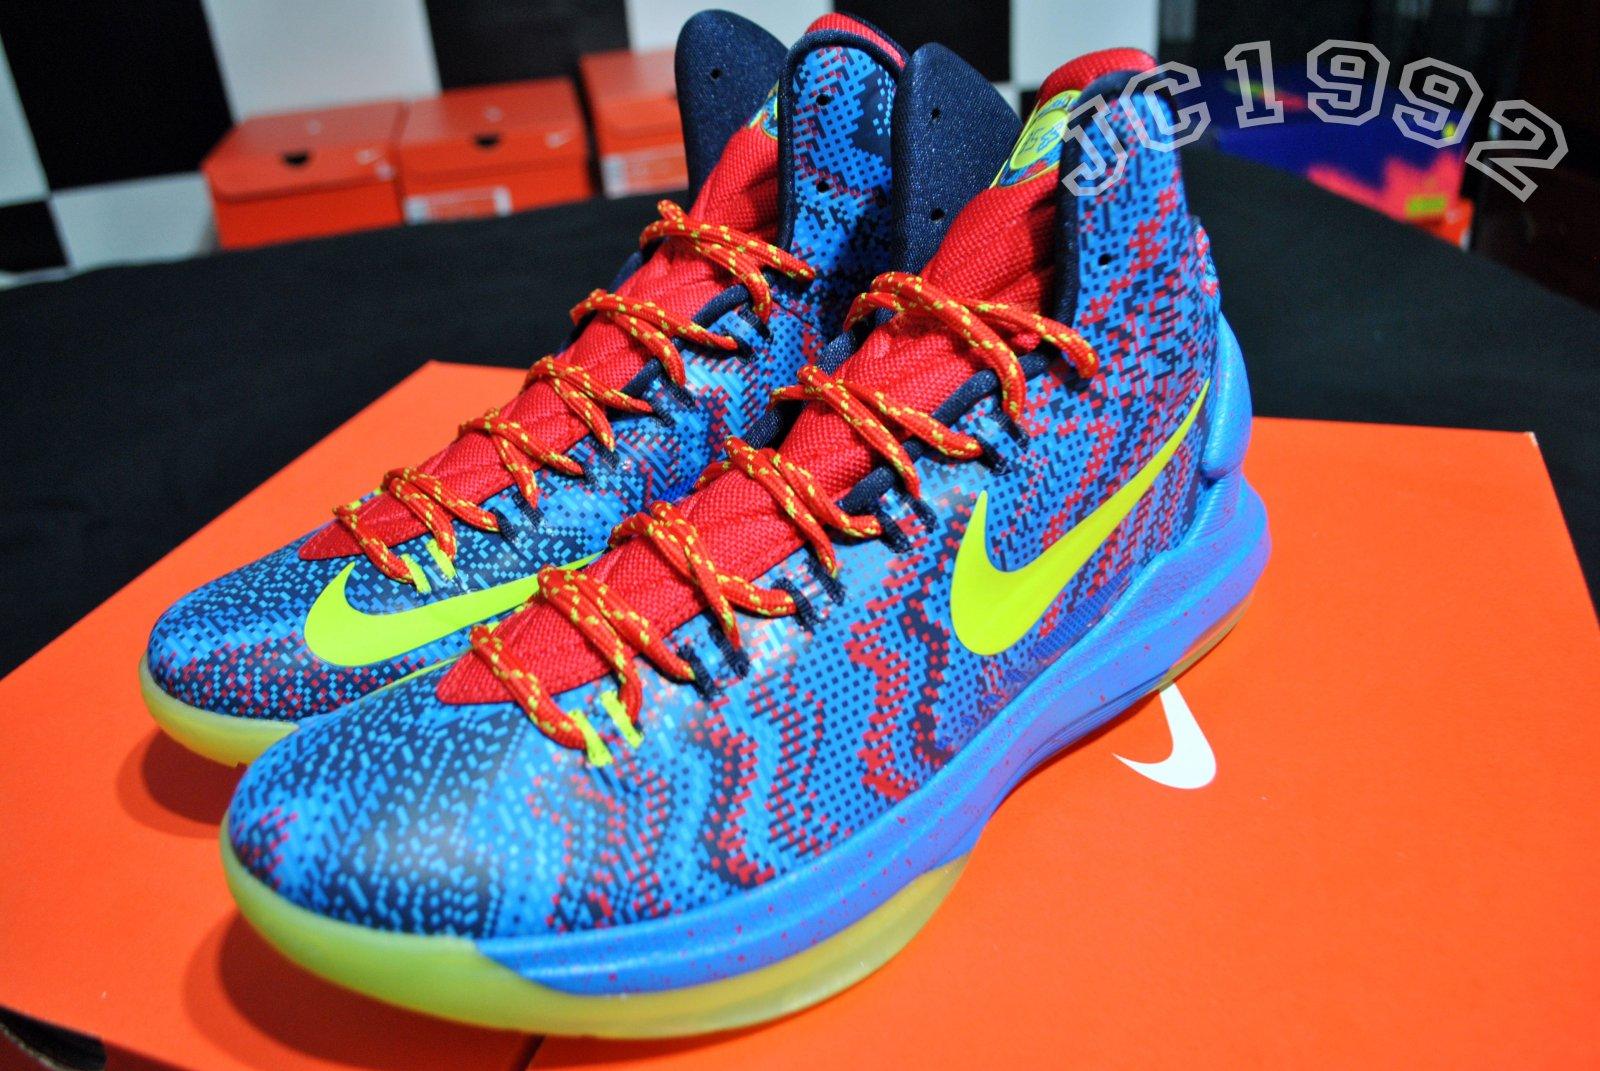 Kd 5 Christmas Nike zoom kd v 5 Kd V Christmas On Feet